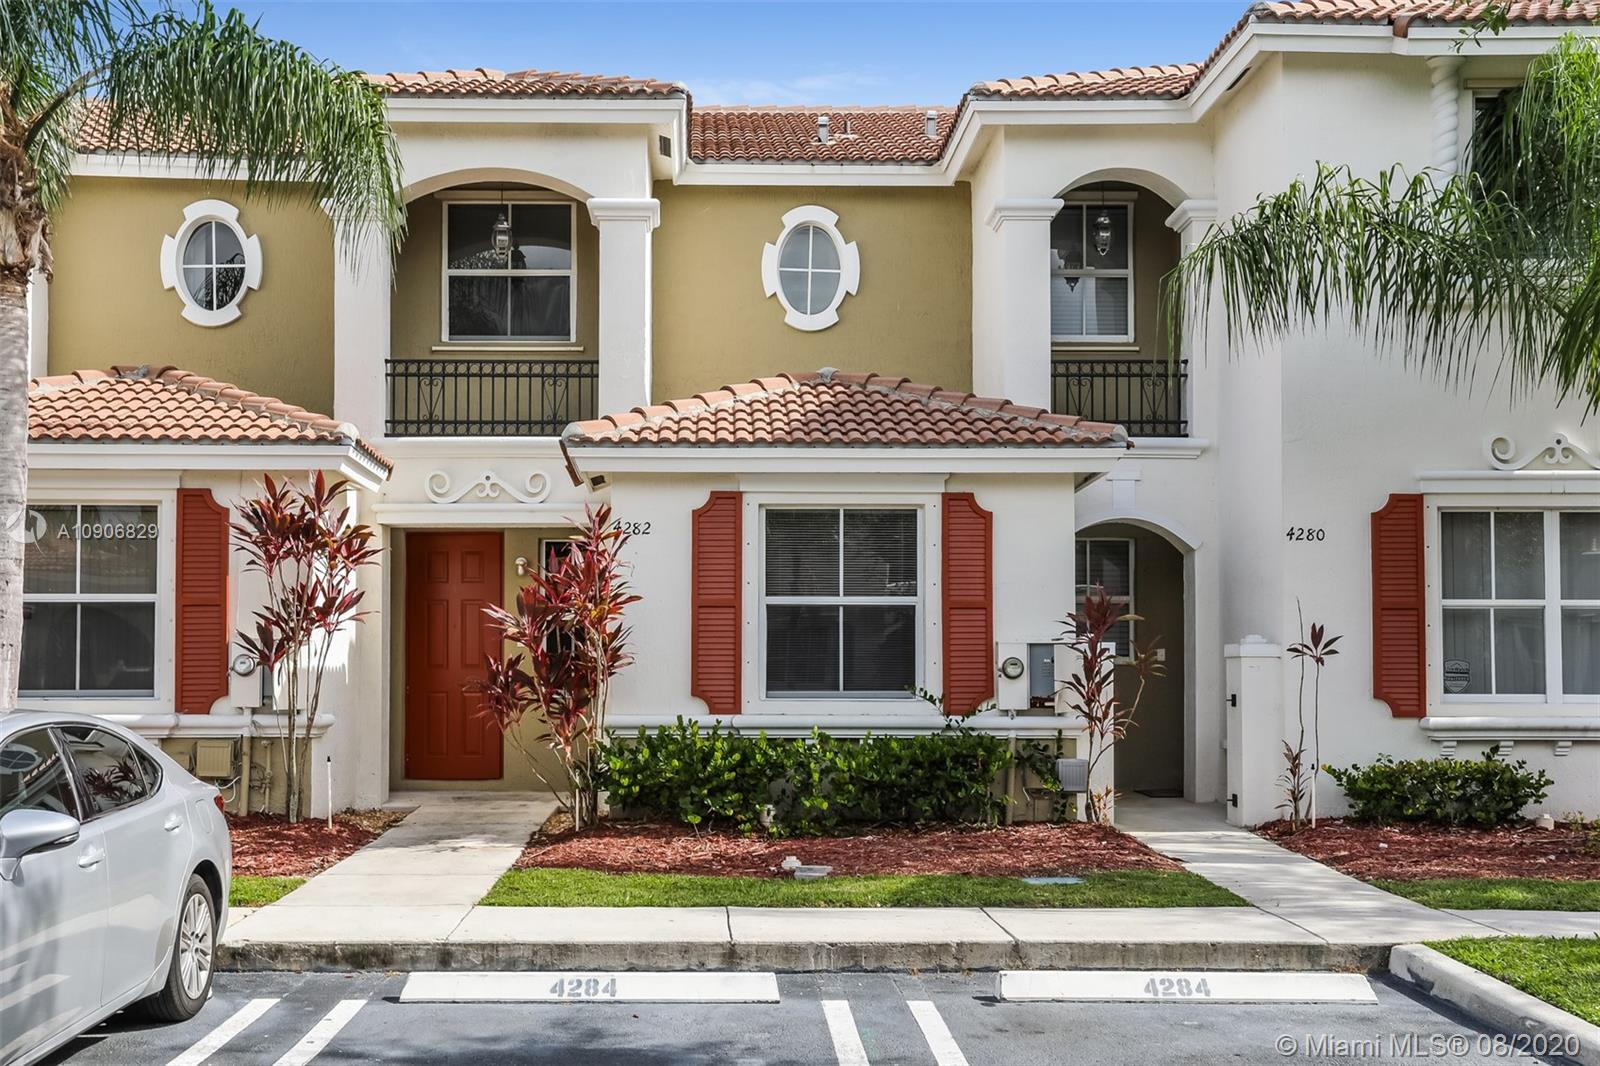 4282 NE 10th Ct Property Photo - Homestead, FL real estate listing